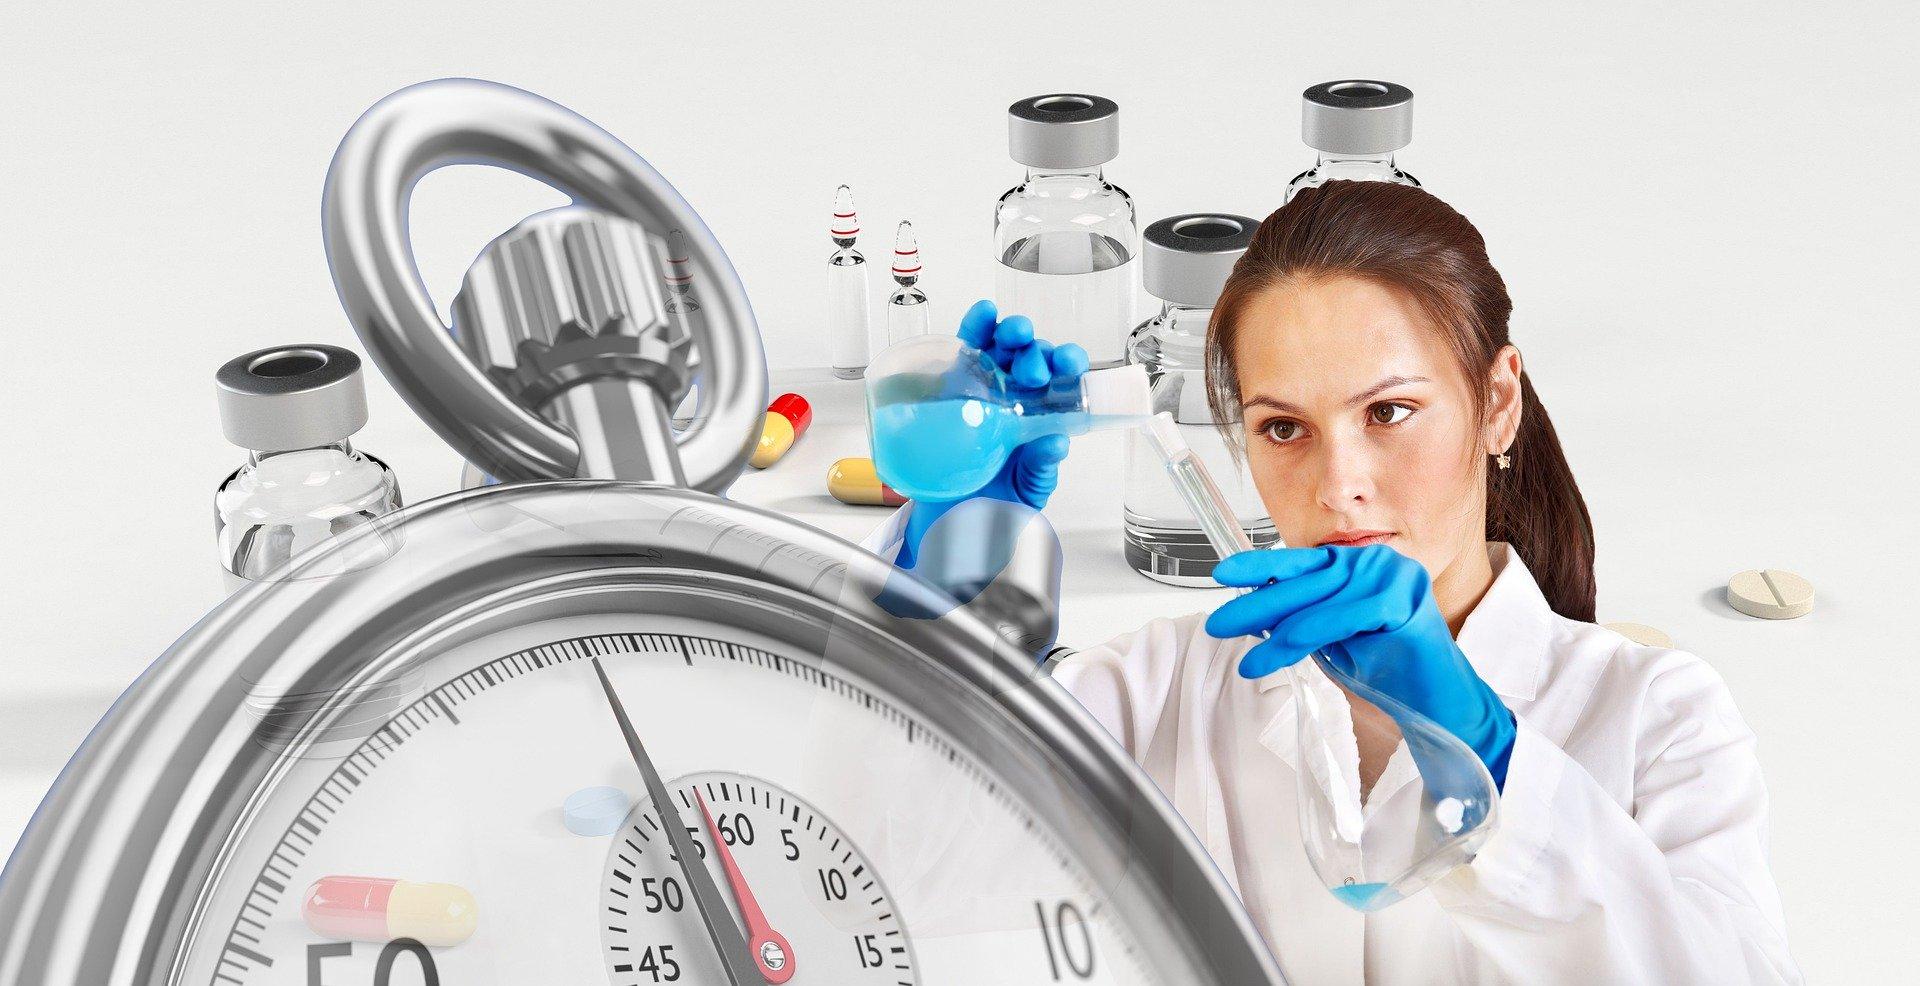 românia stare de urgență locuri la terapie intensiva coronavirus